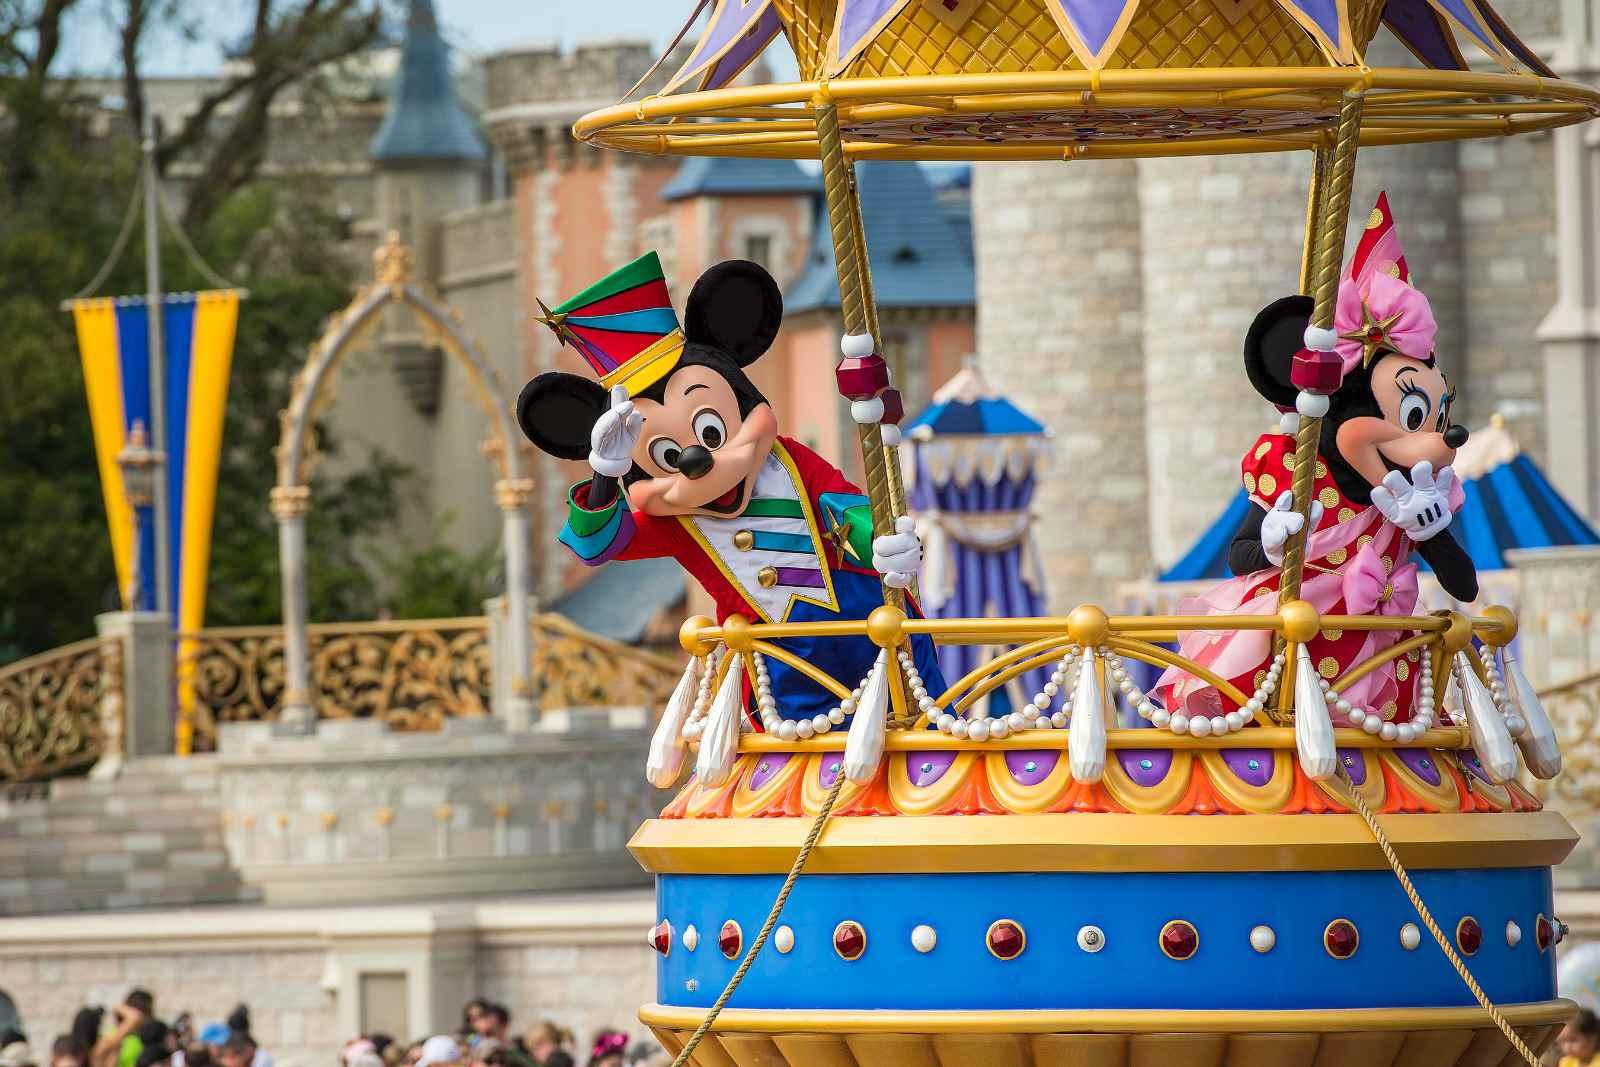 Micky and Minnie en un desfile de carrozas